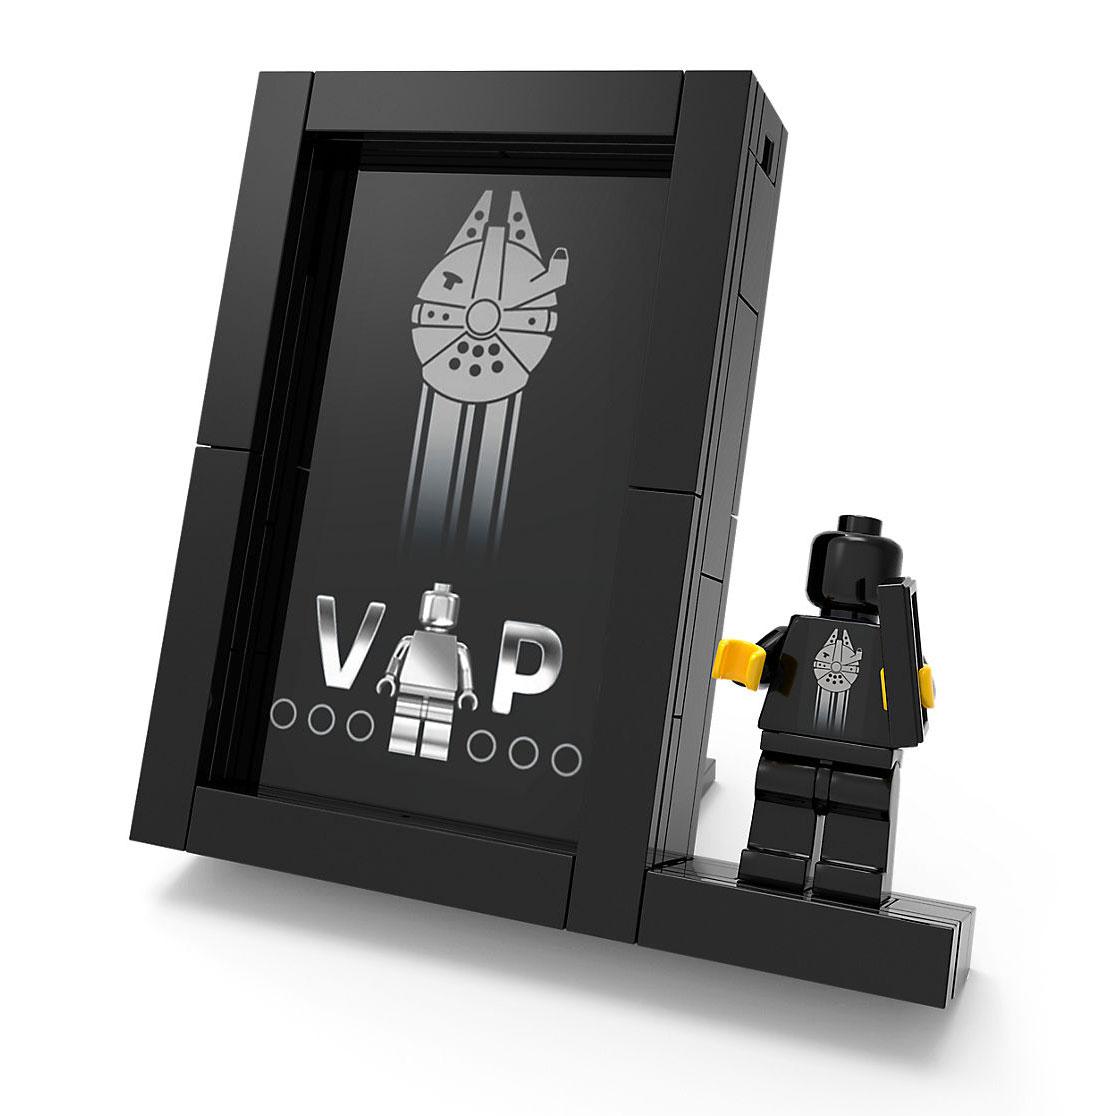 lego-star-wars-vip-card-display-stand-closeup